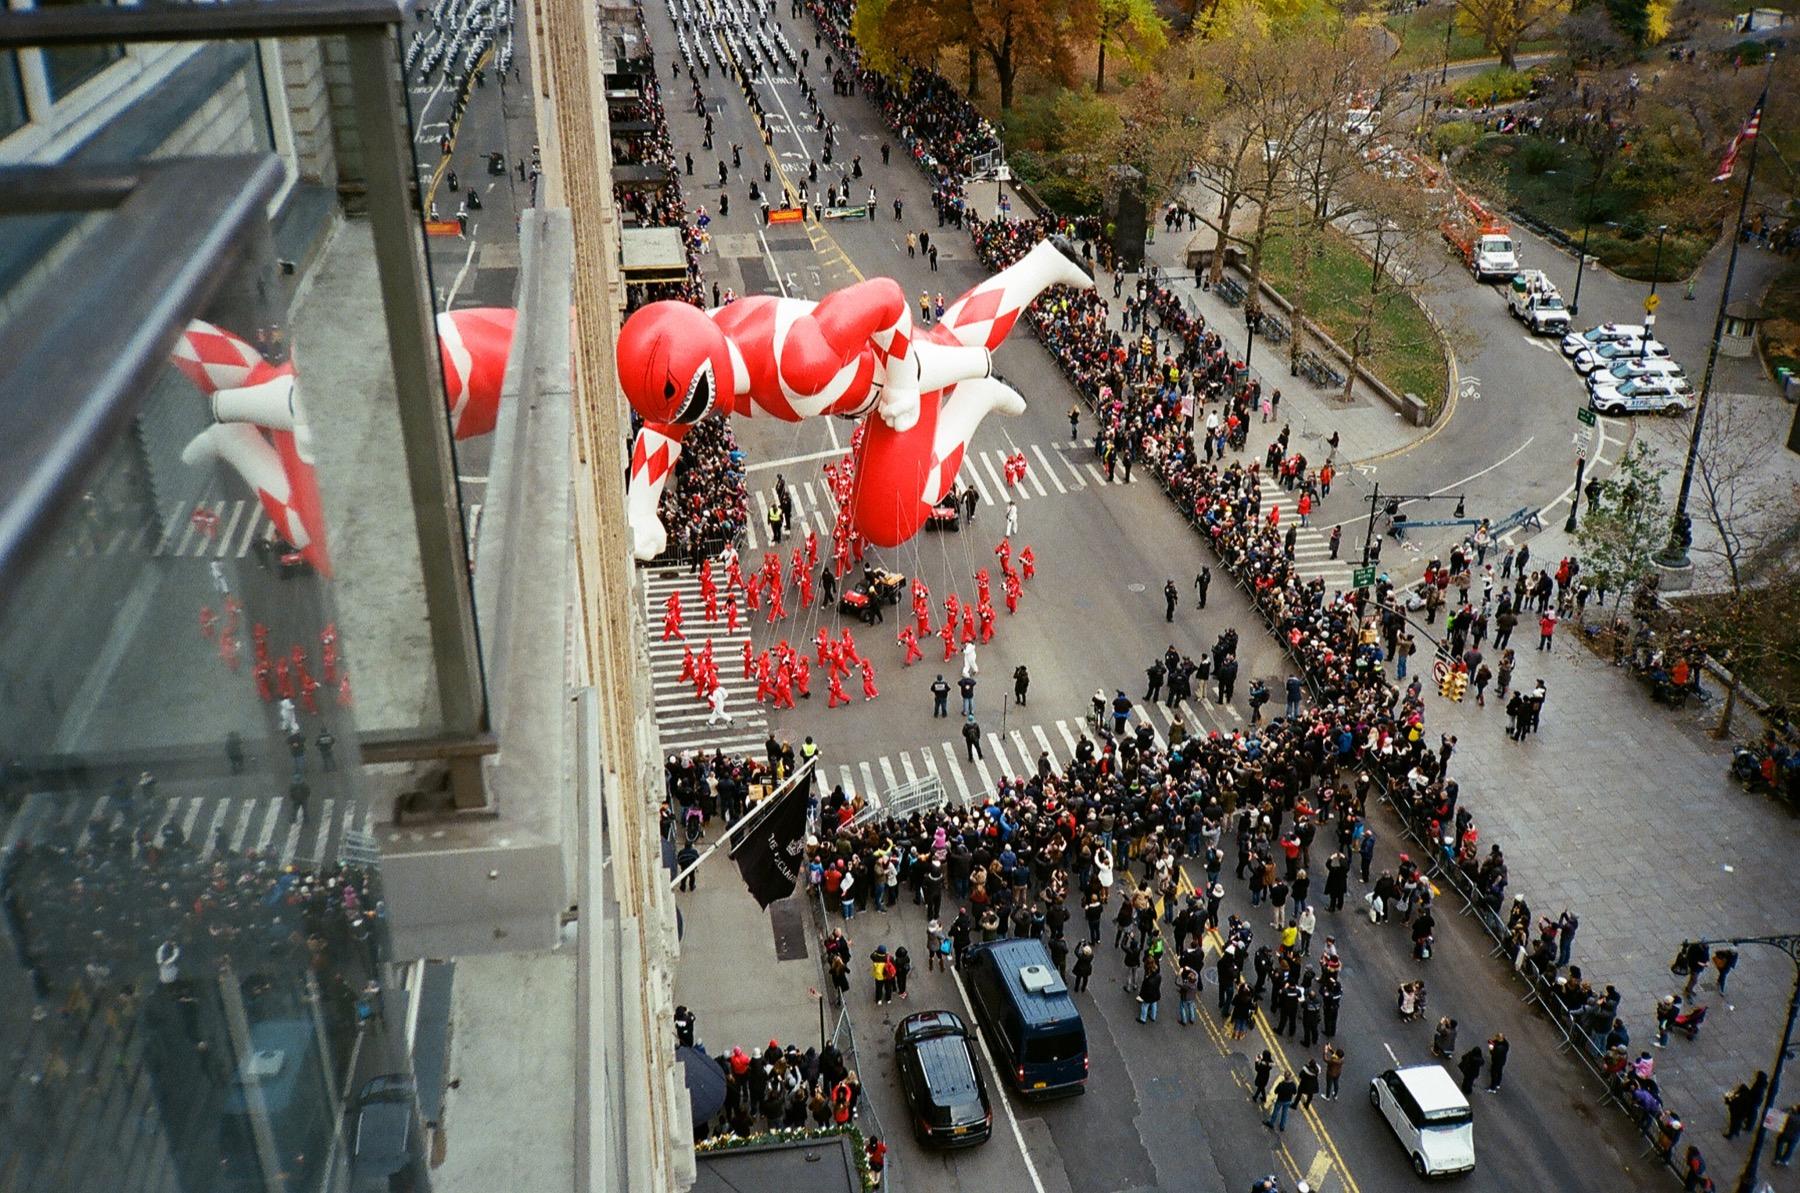 cameraville_olympus_xa_rangefinder_new_york_thanksgiving_16.JPG